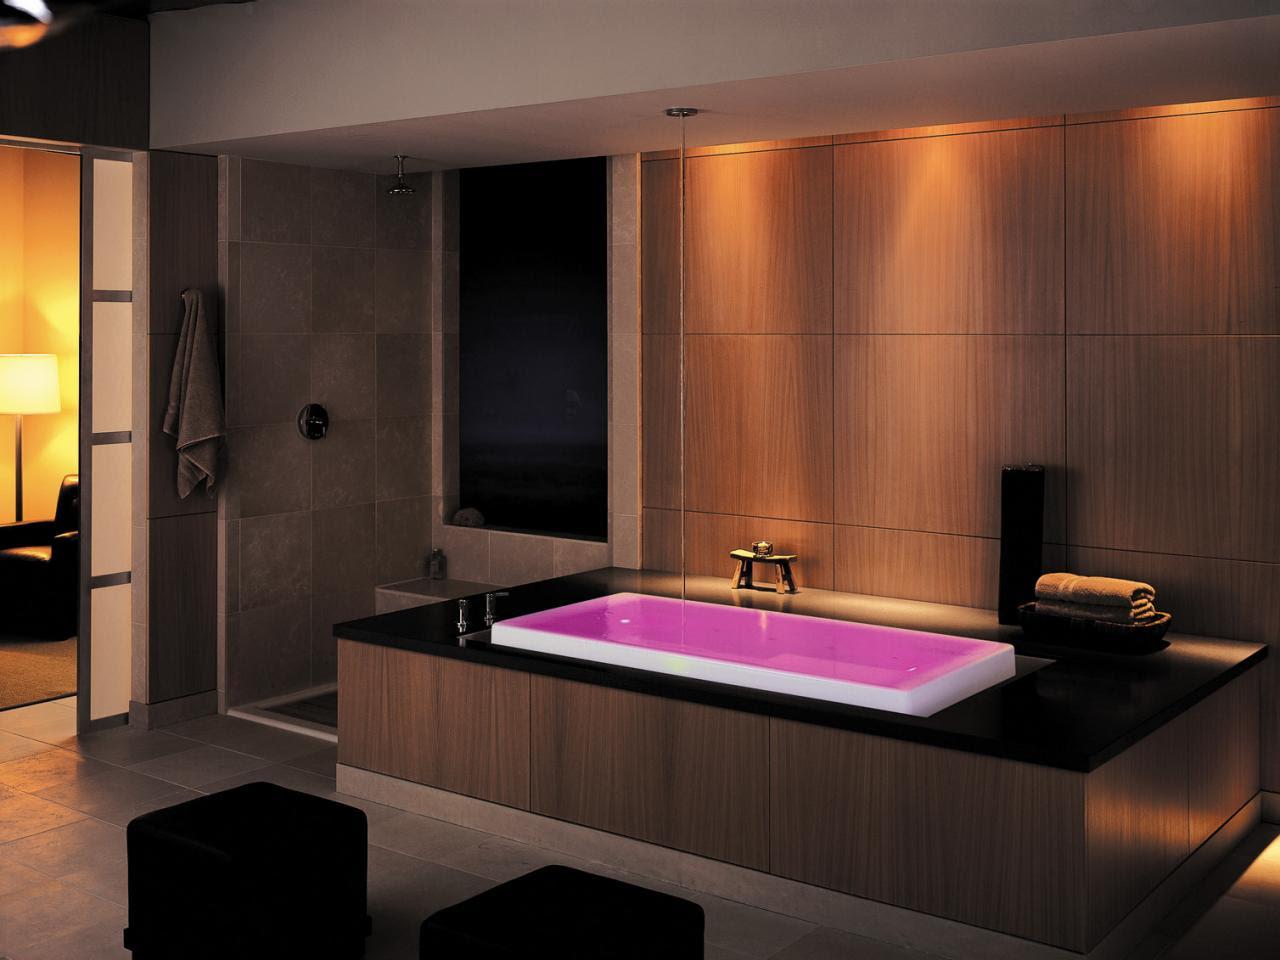 RX Kohler_sok chromatherapy bathtub 1_s4x3